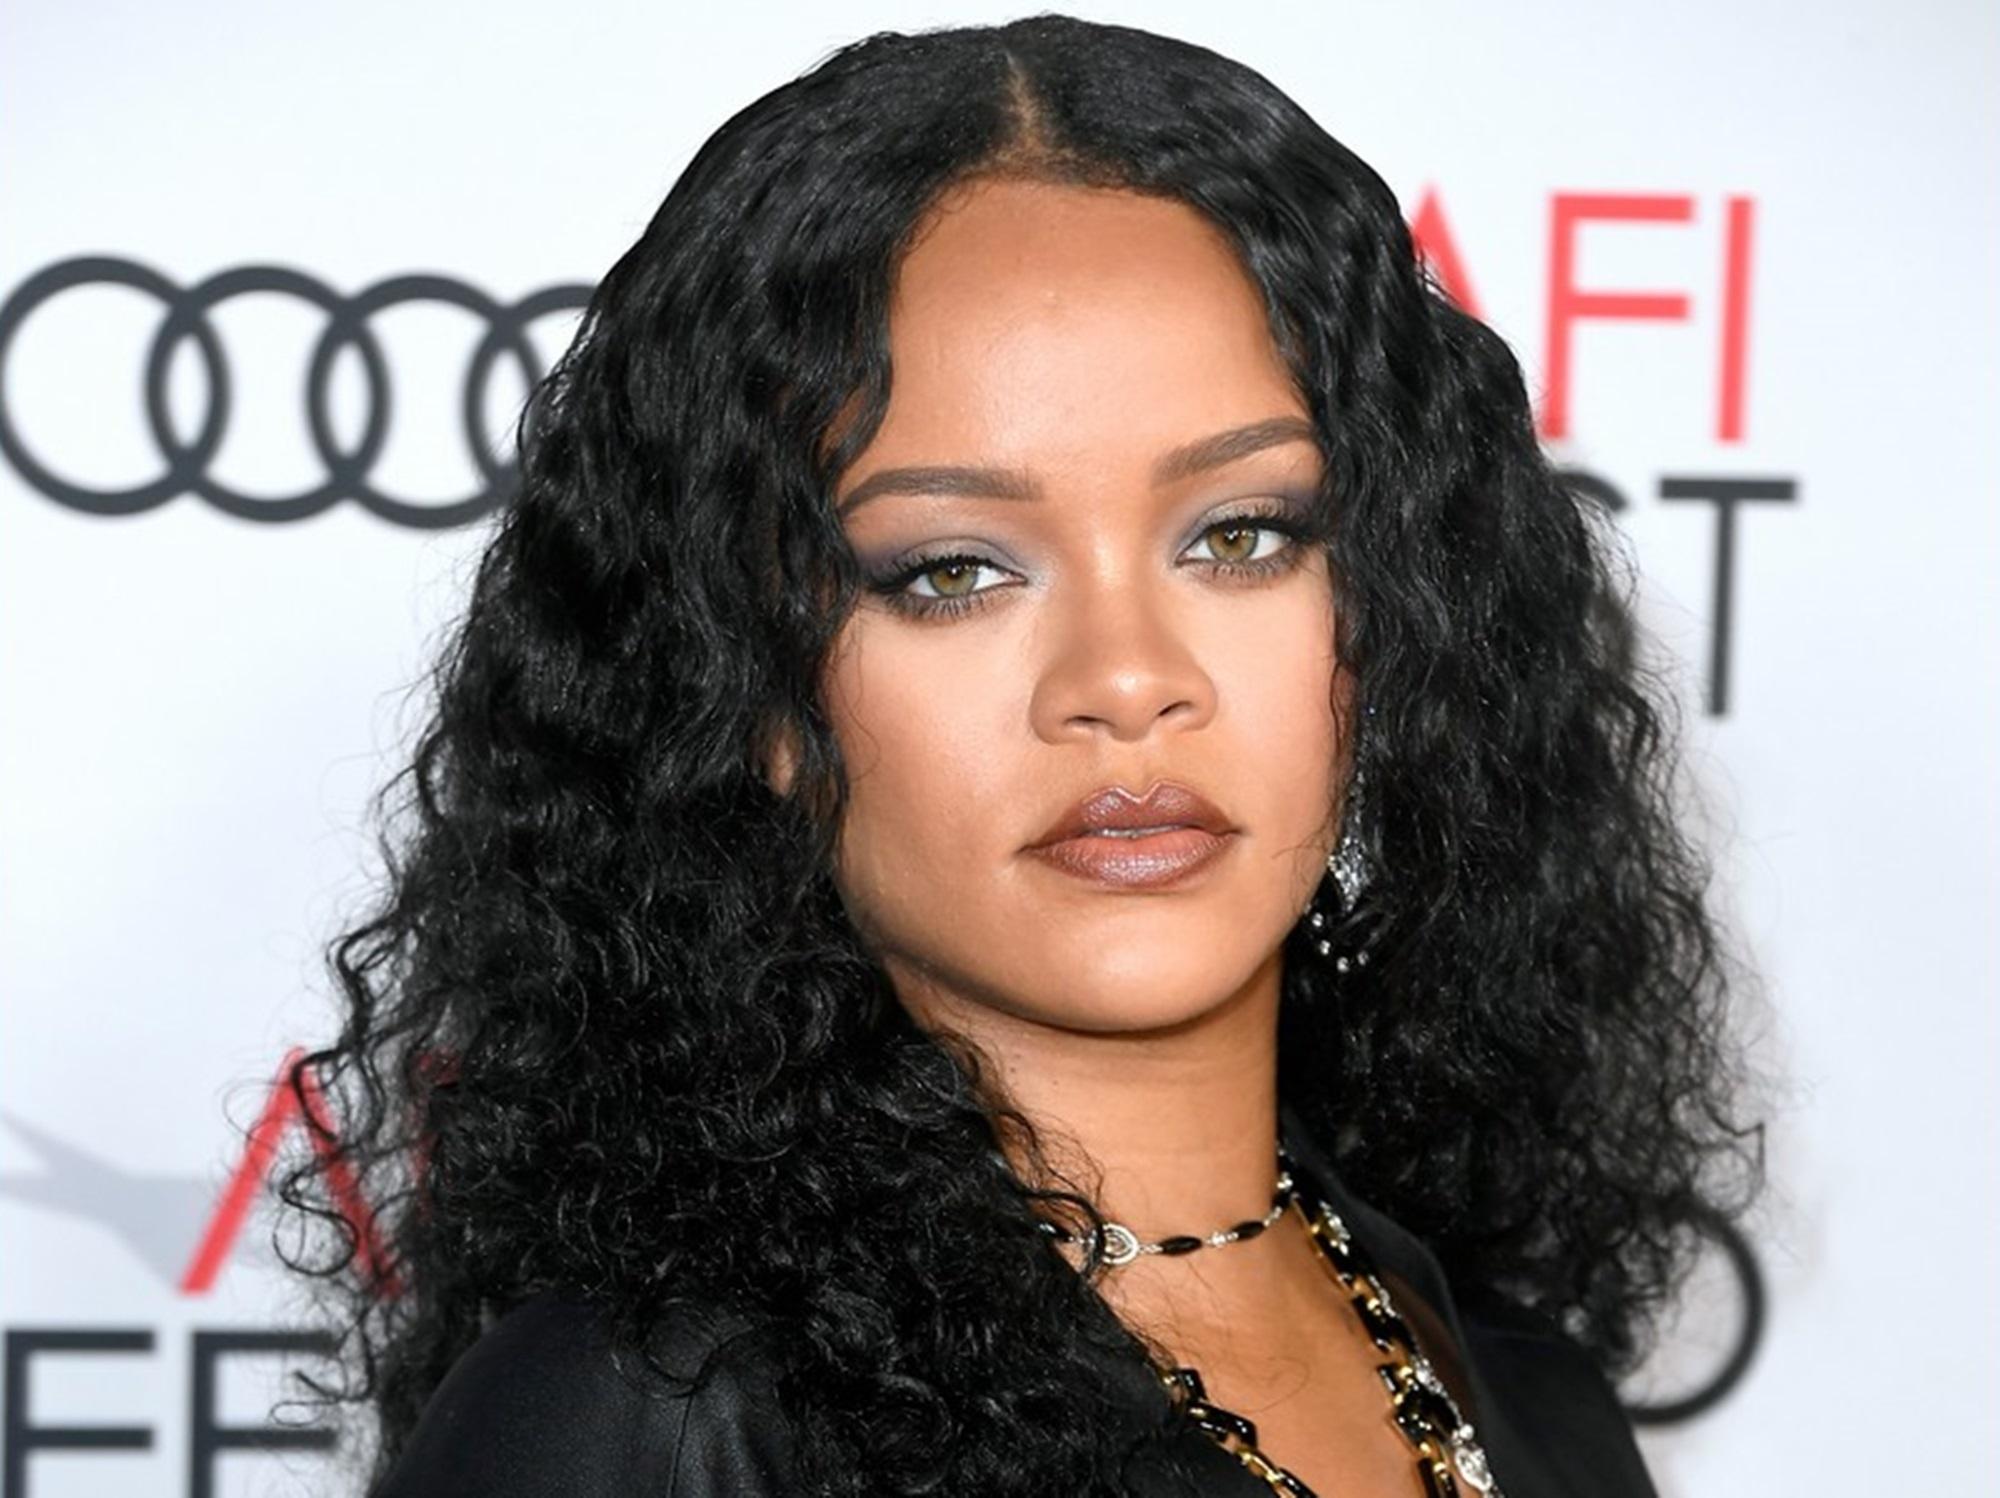 Rihanna Hassan Jameel Barbados New Album